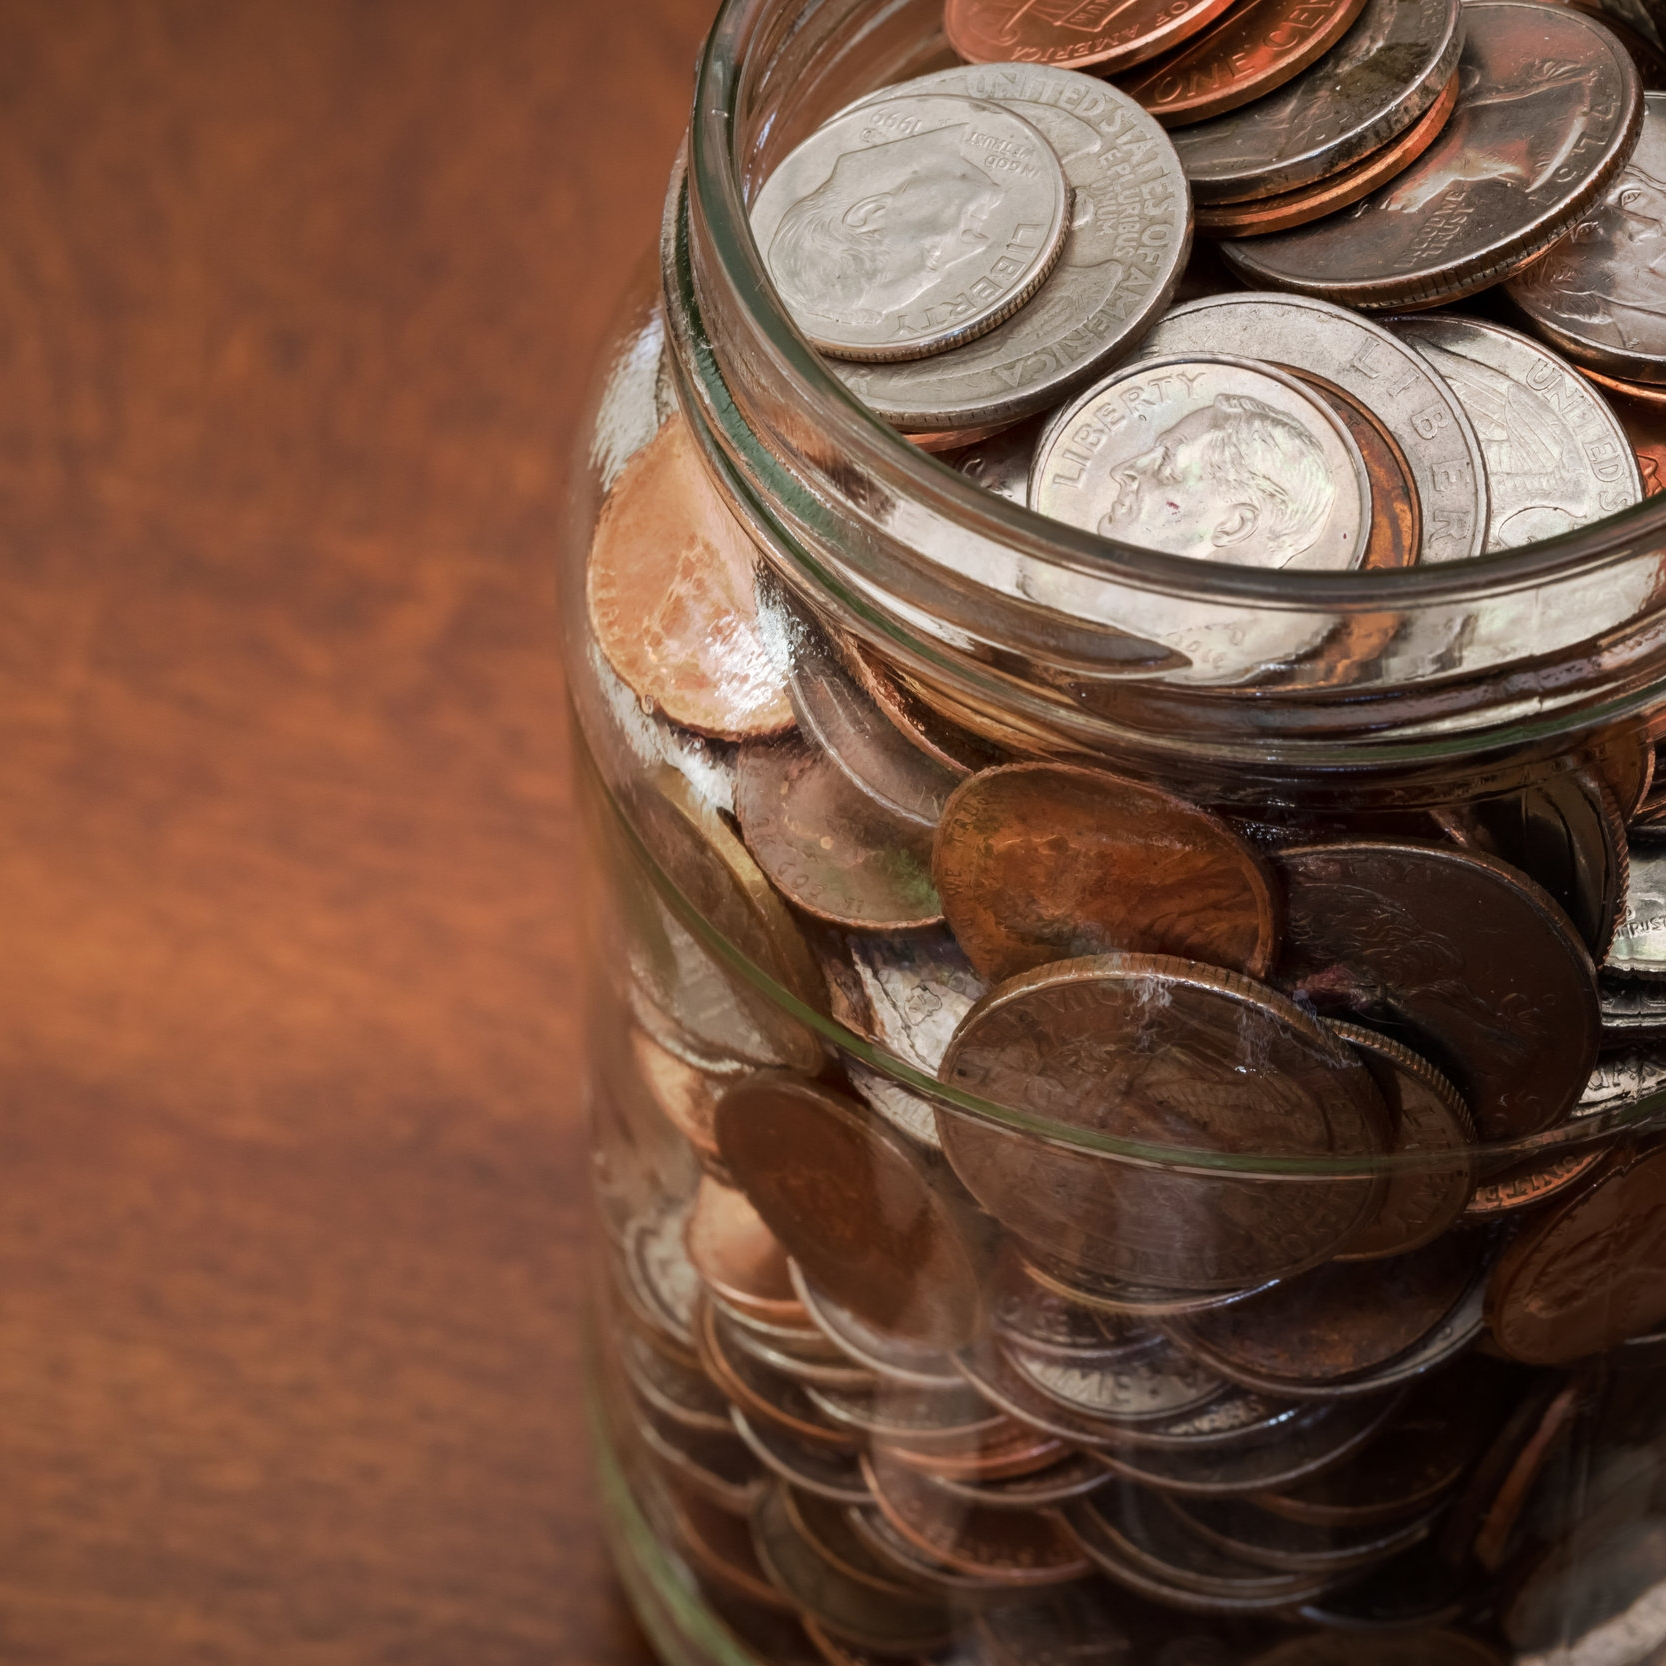 COINS FOR CHILDREN